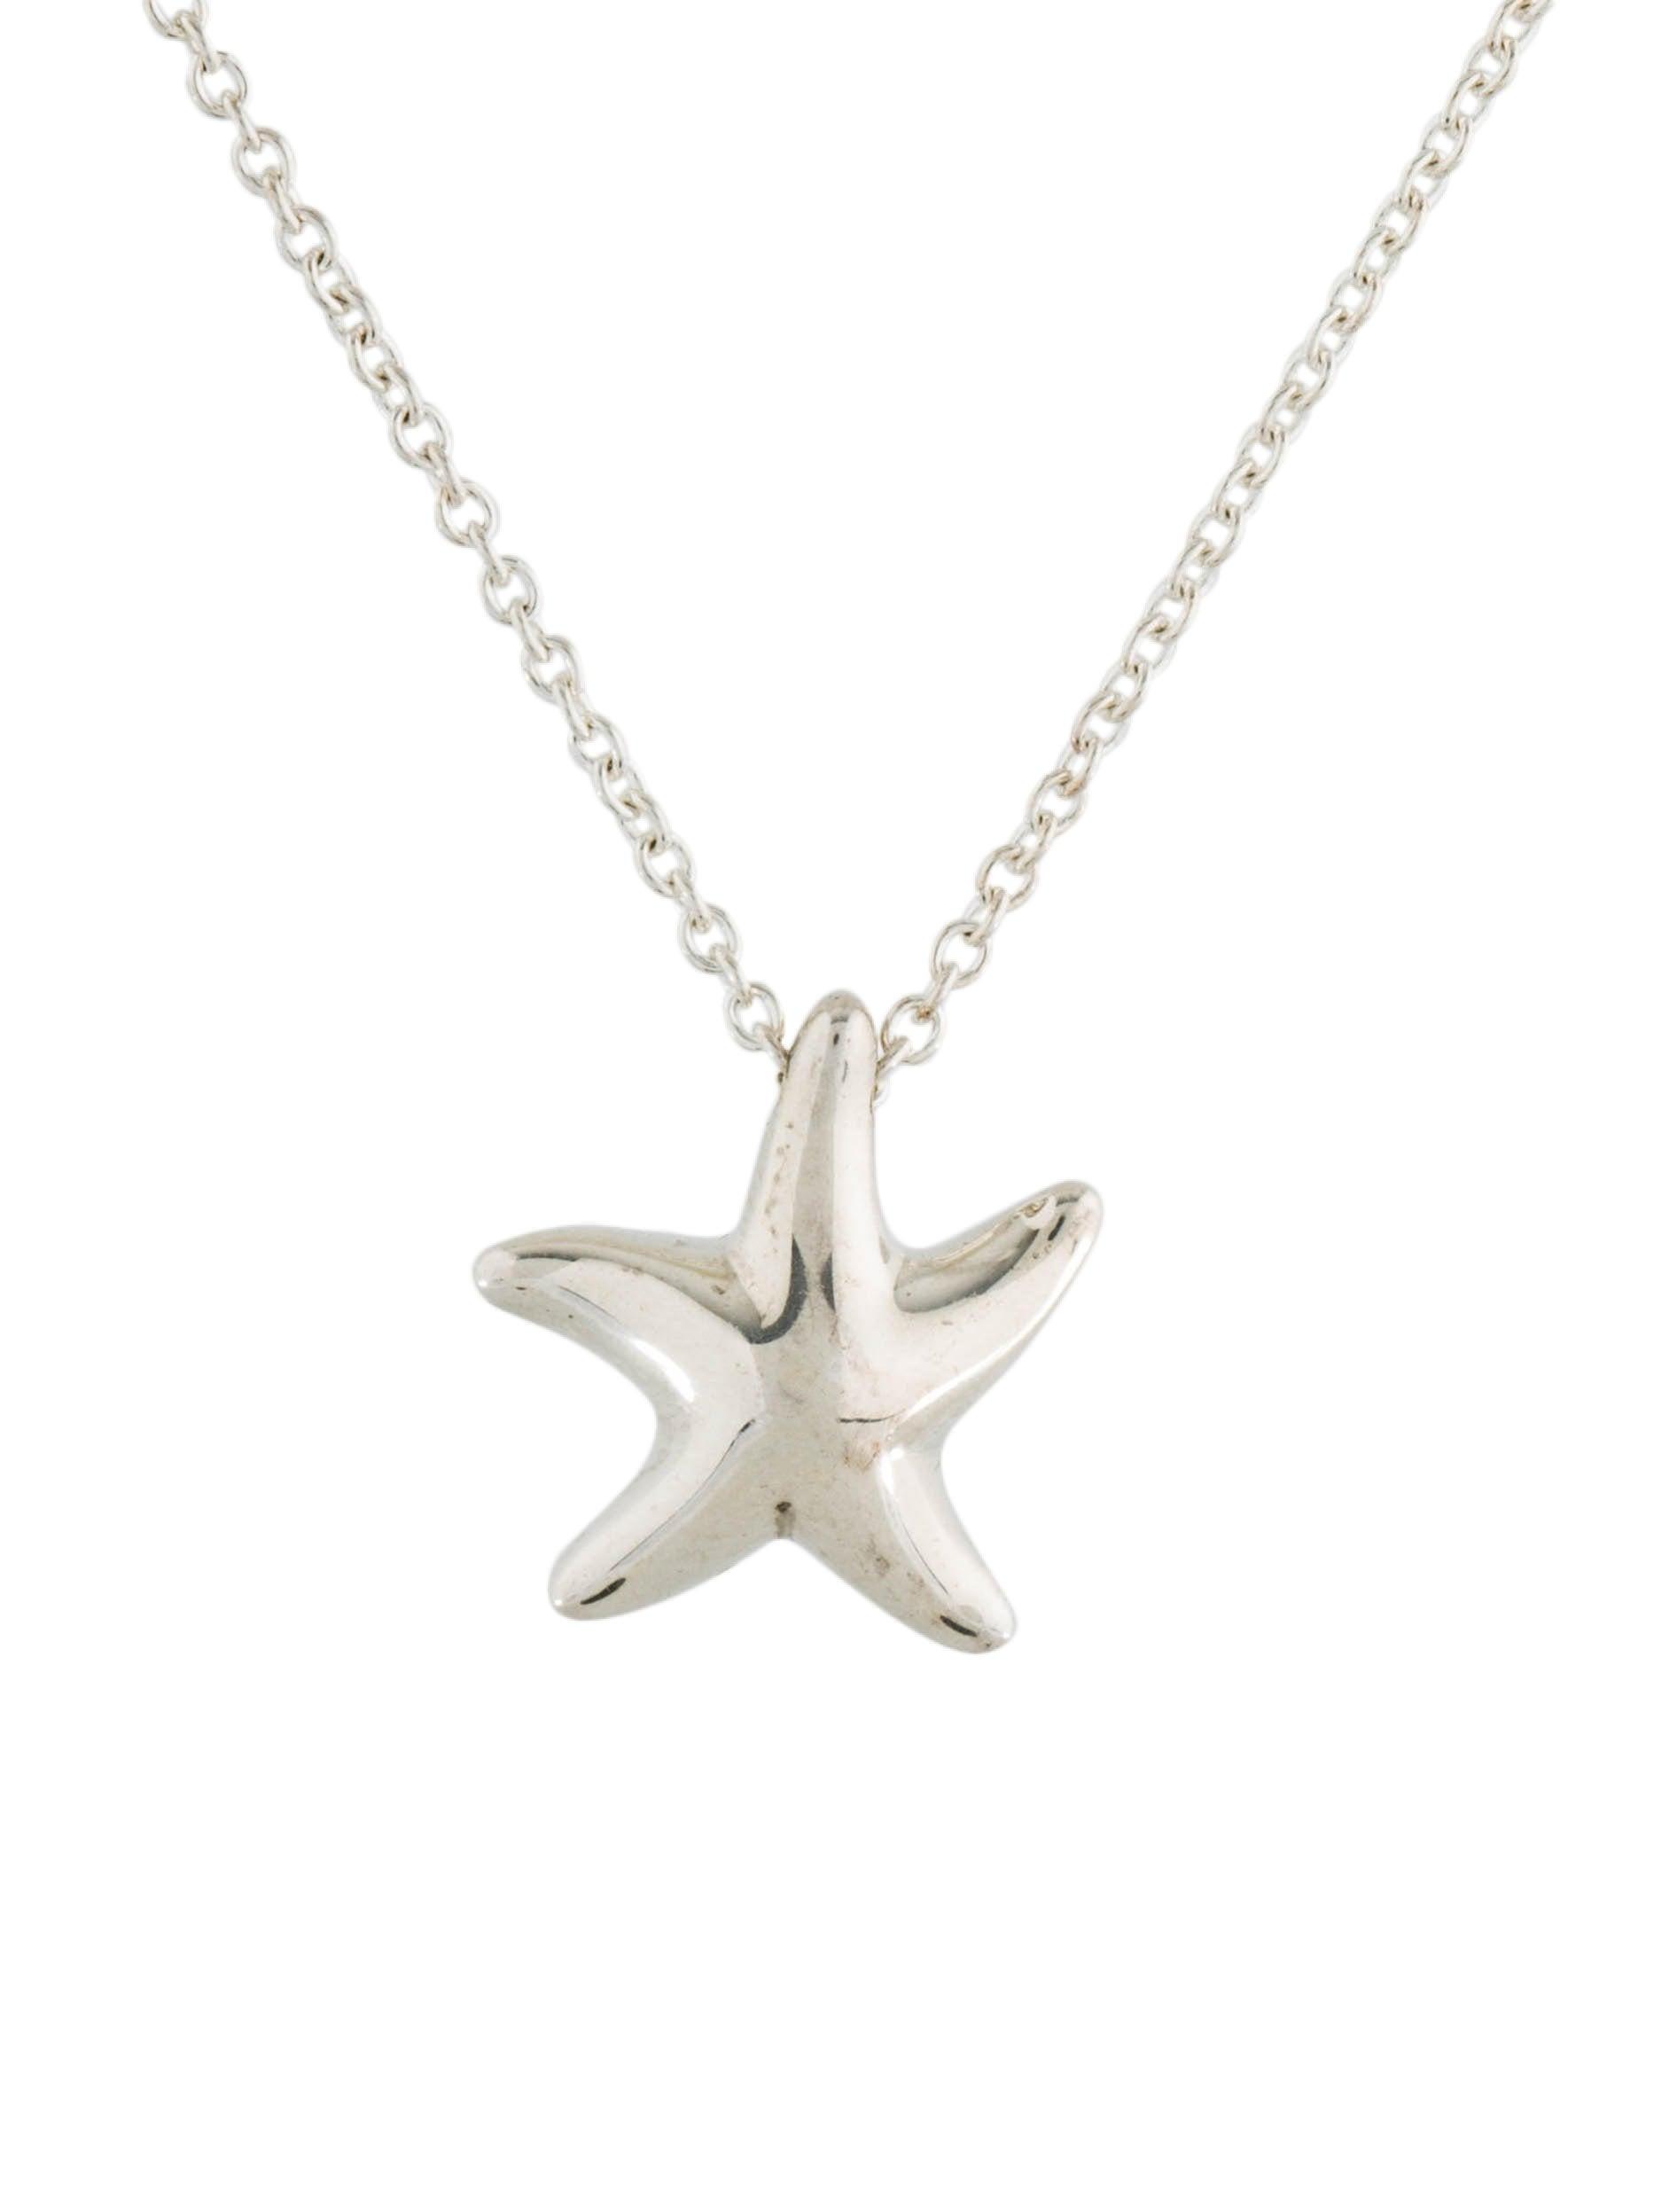 Tiffany co starfish pendant necklace necklaces tif78037 the starfish pendant necklace aloadofball Choice Image